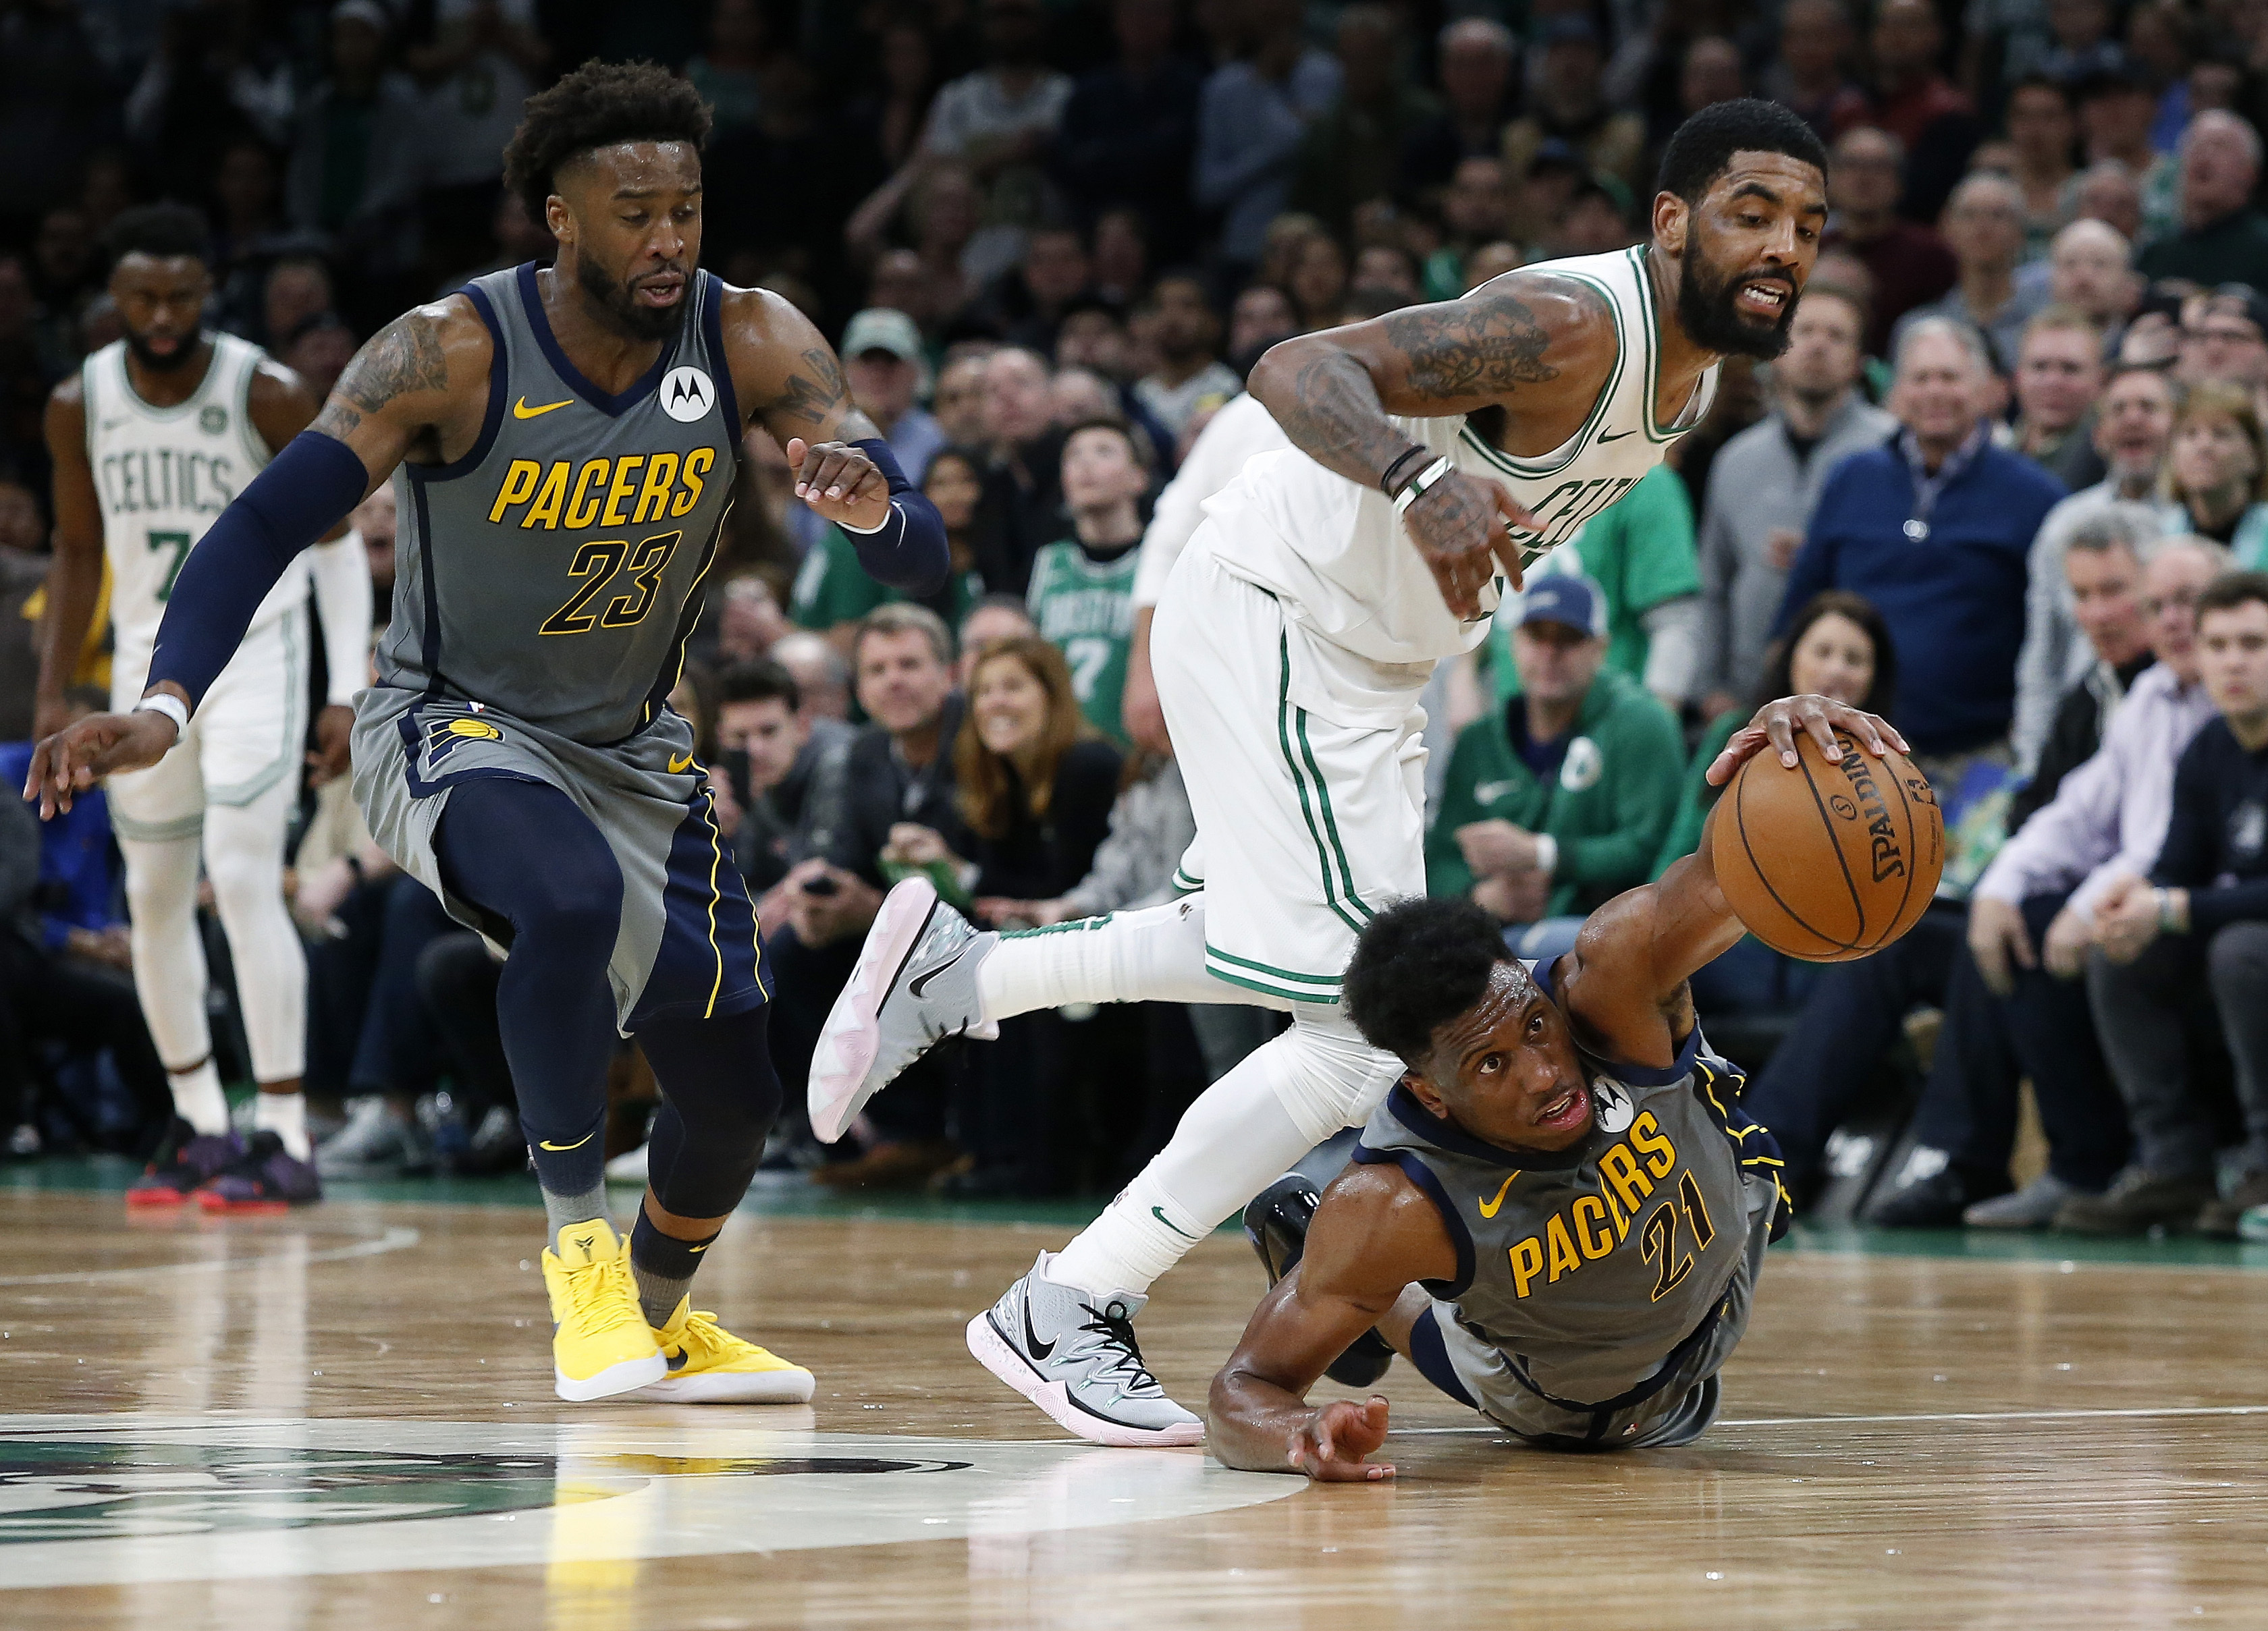 APTOPIX Pacers Celtics Basketball_1553911866977